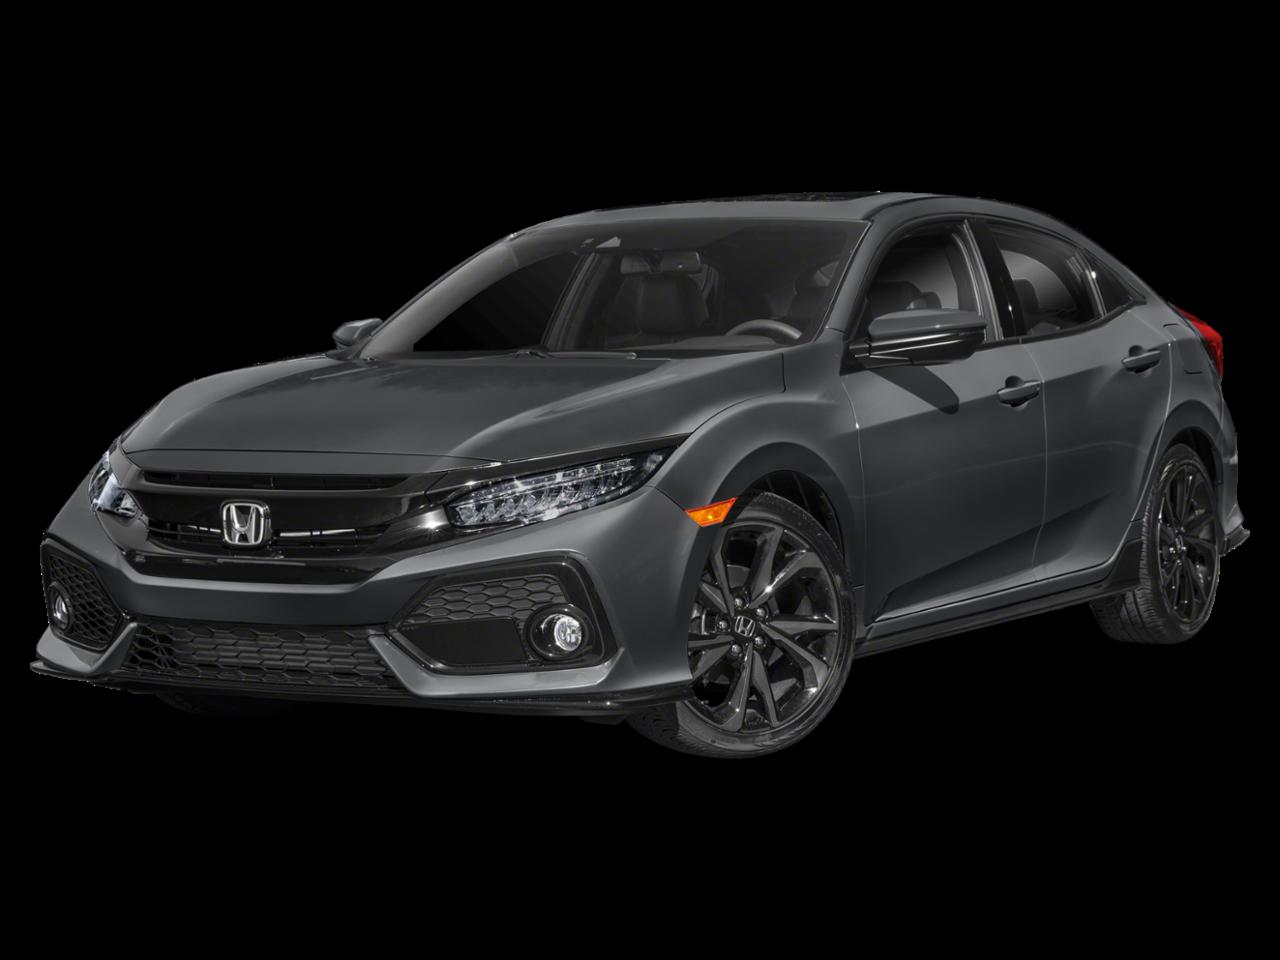 Honda 2019 Civic Hatchback Sport Touring